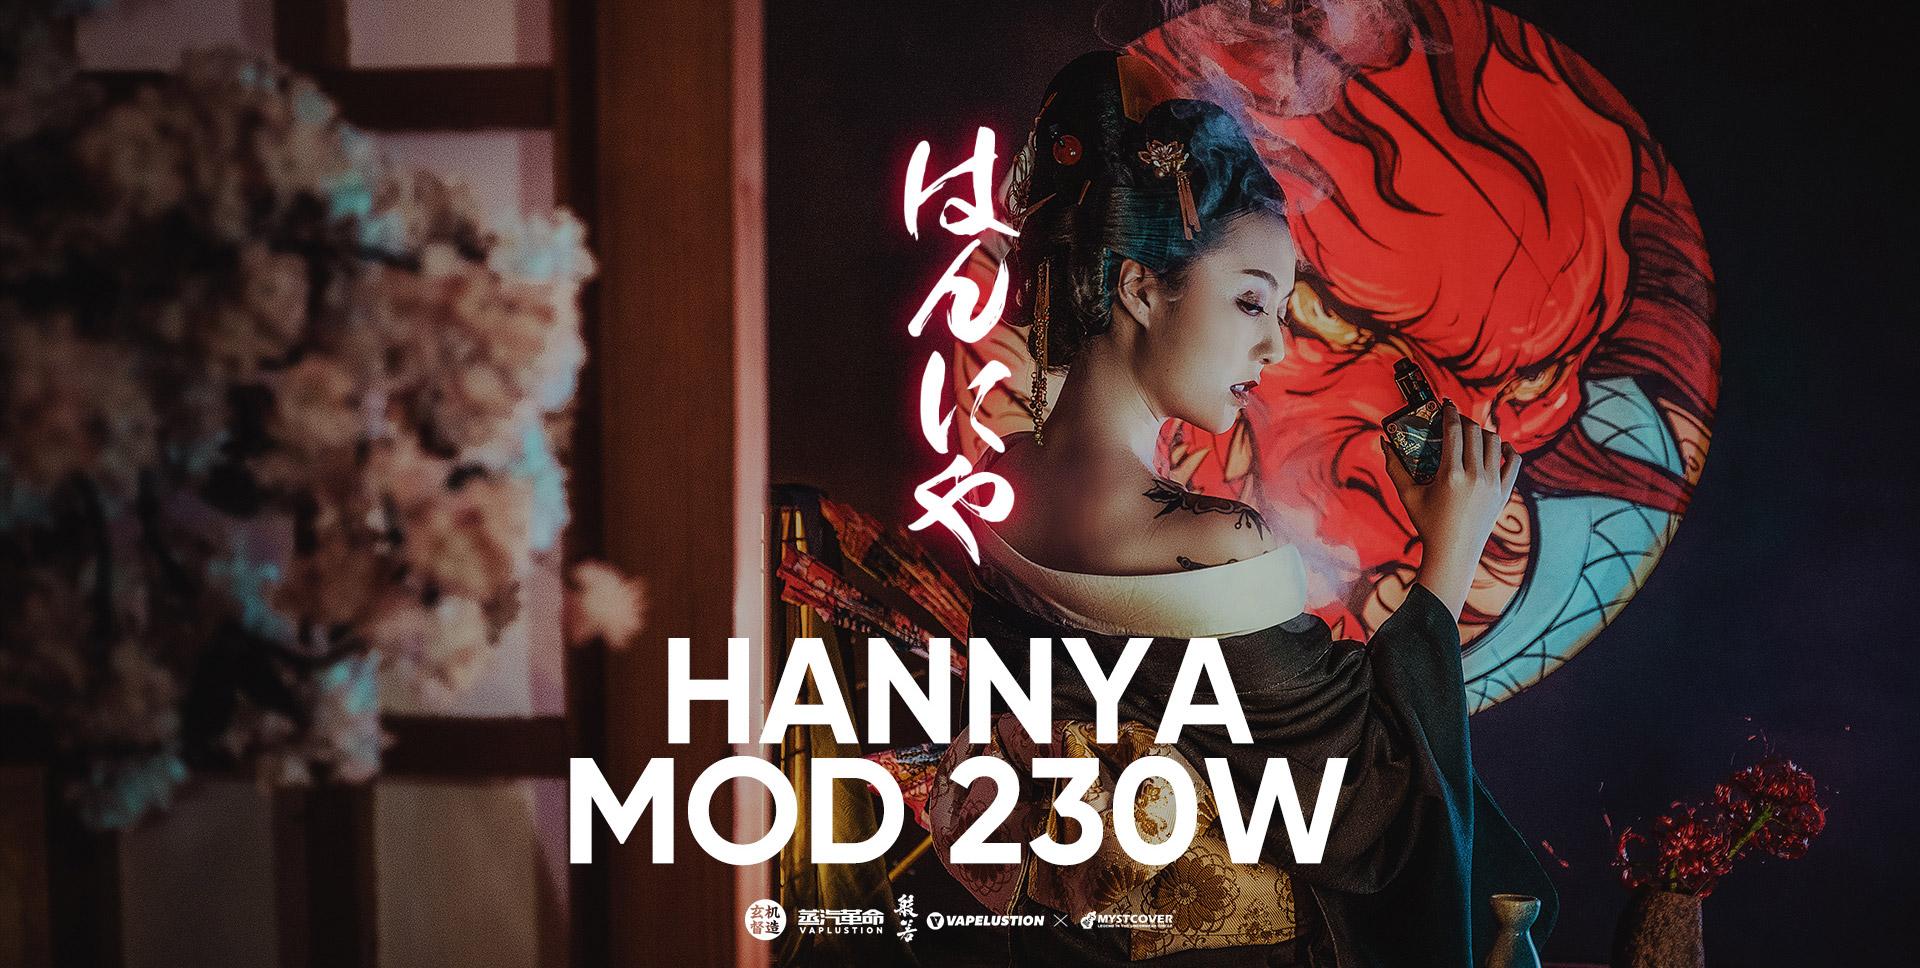 Hannya Mod